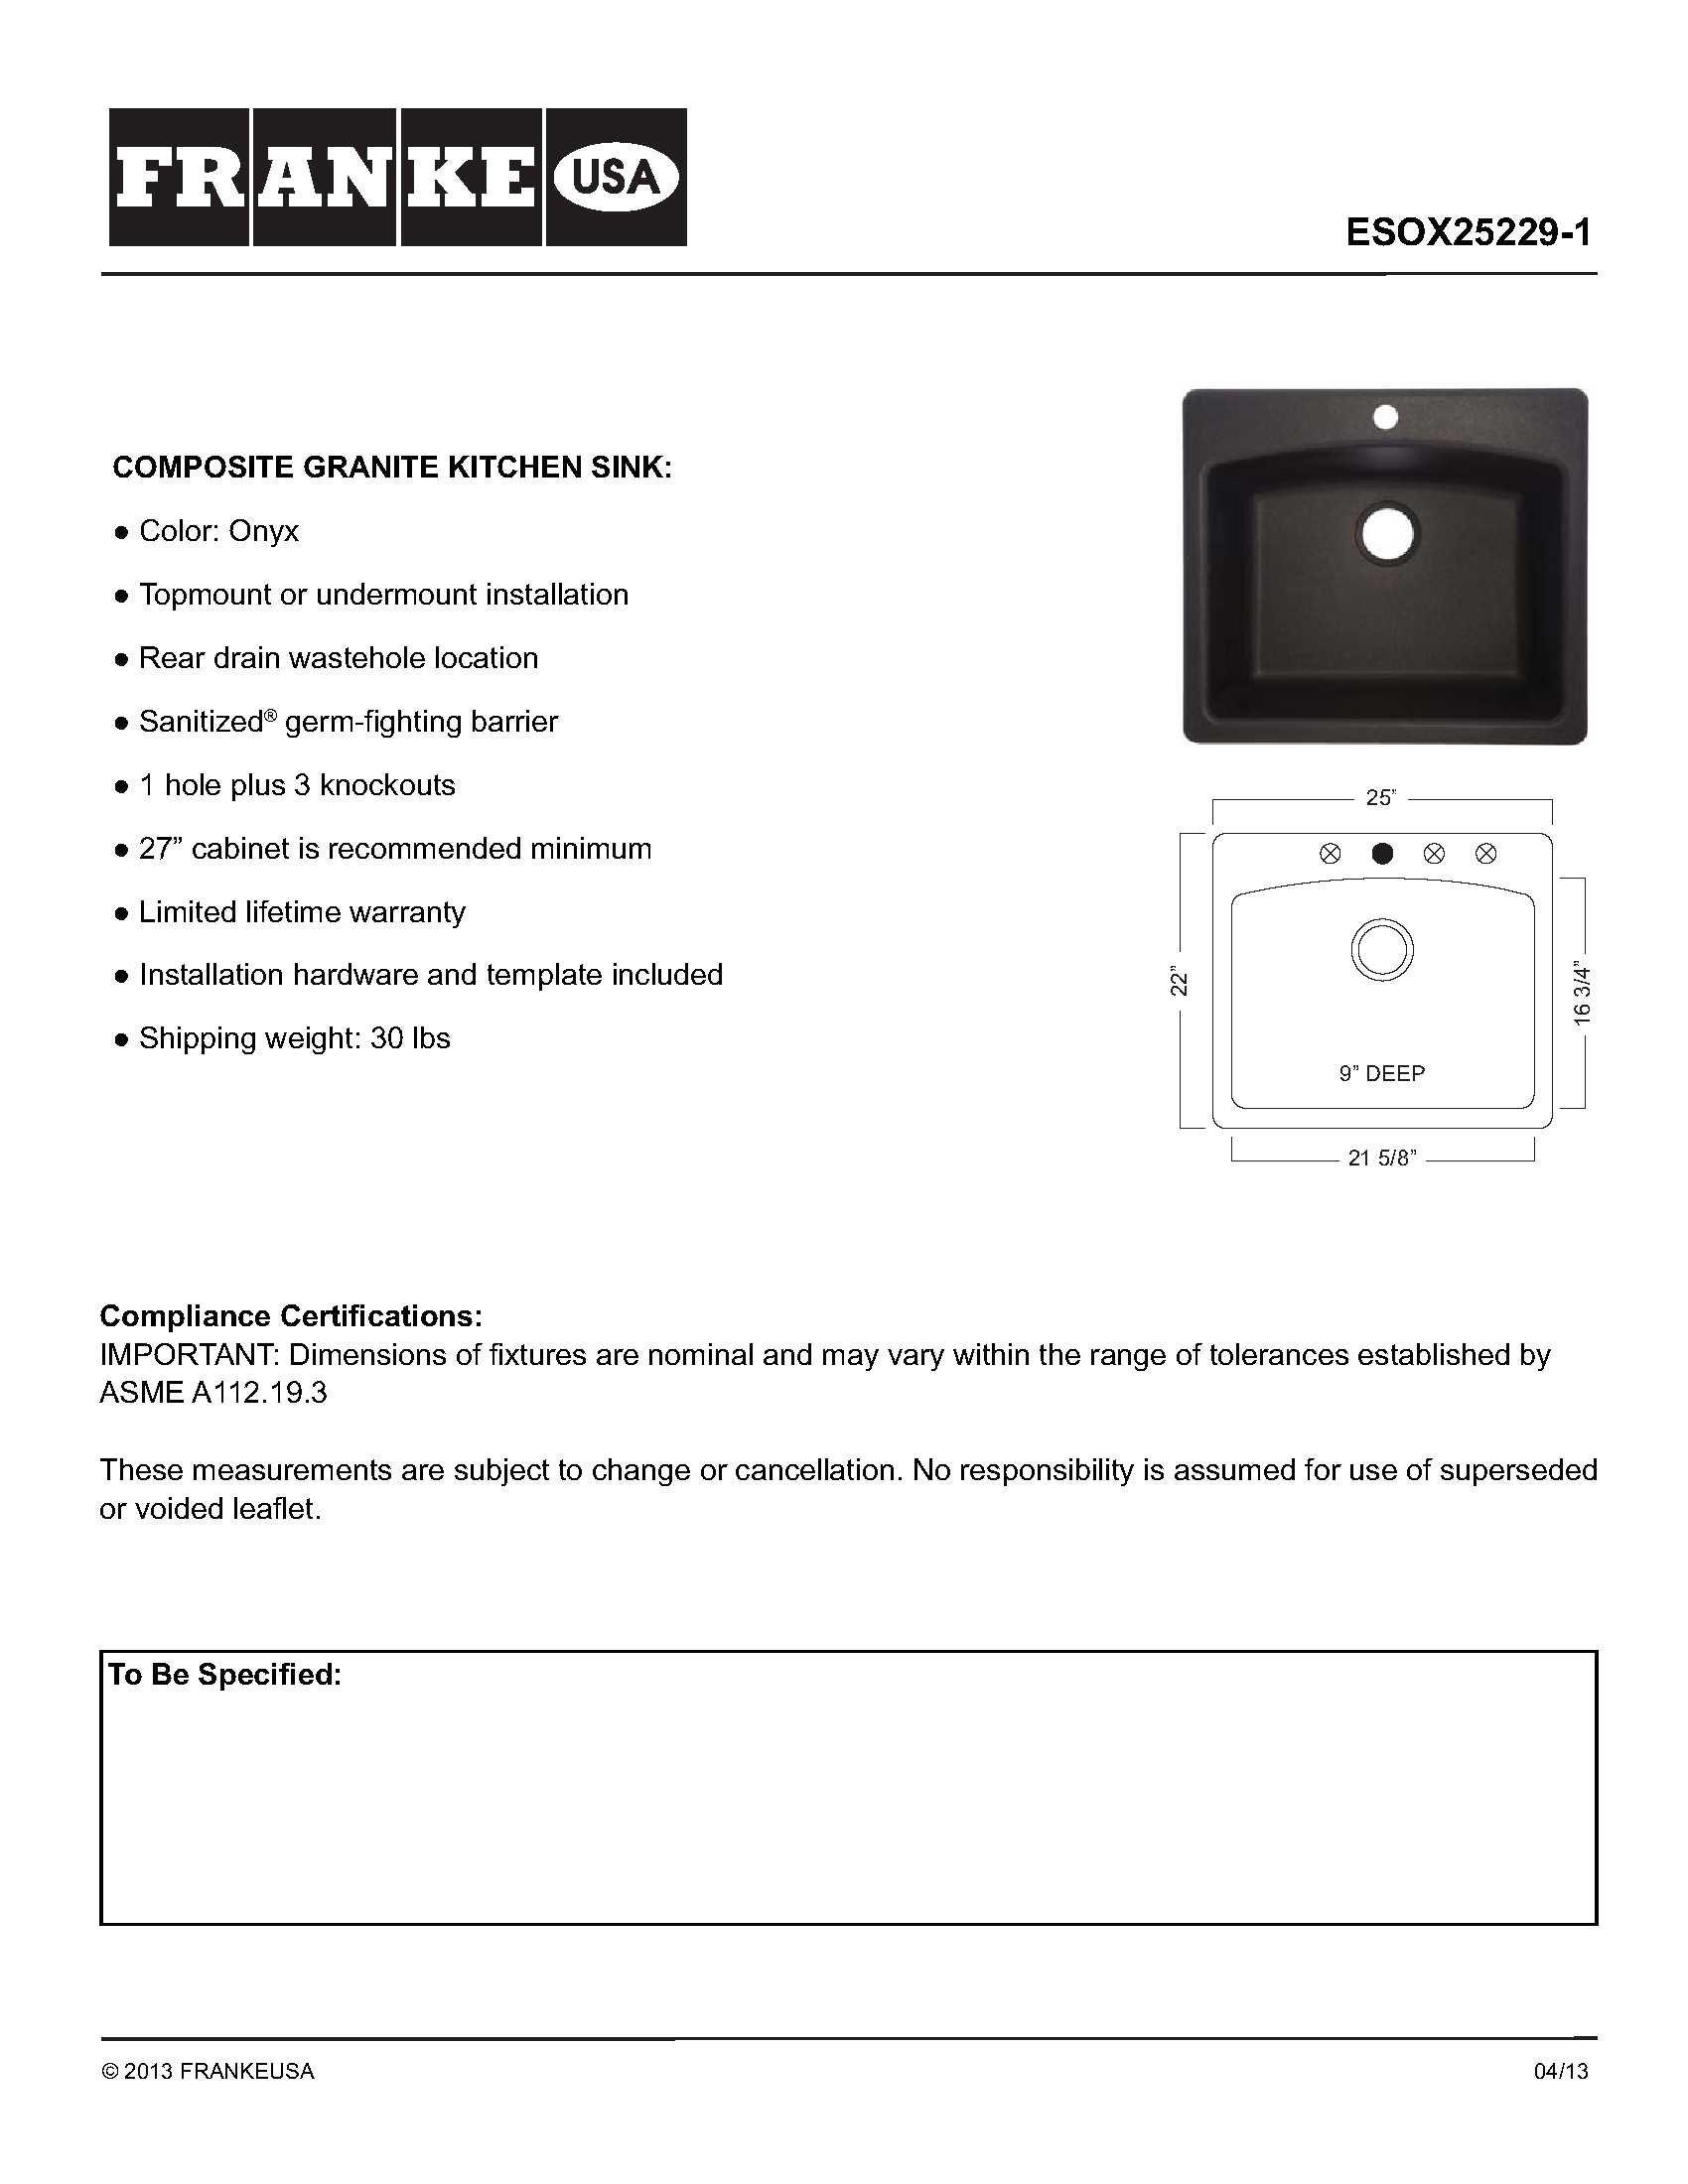 Franke ESOX25229-1 Ellipse 25'' Dual Mount Granite Single Bowl Kitchen Sink, Onyx, 25'' x 22'' x 9'', by FrankeUSA